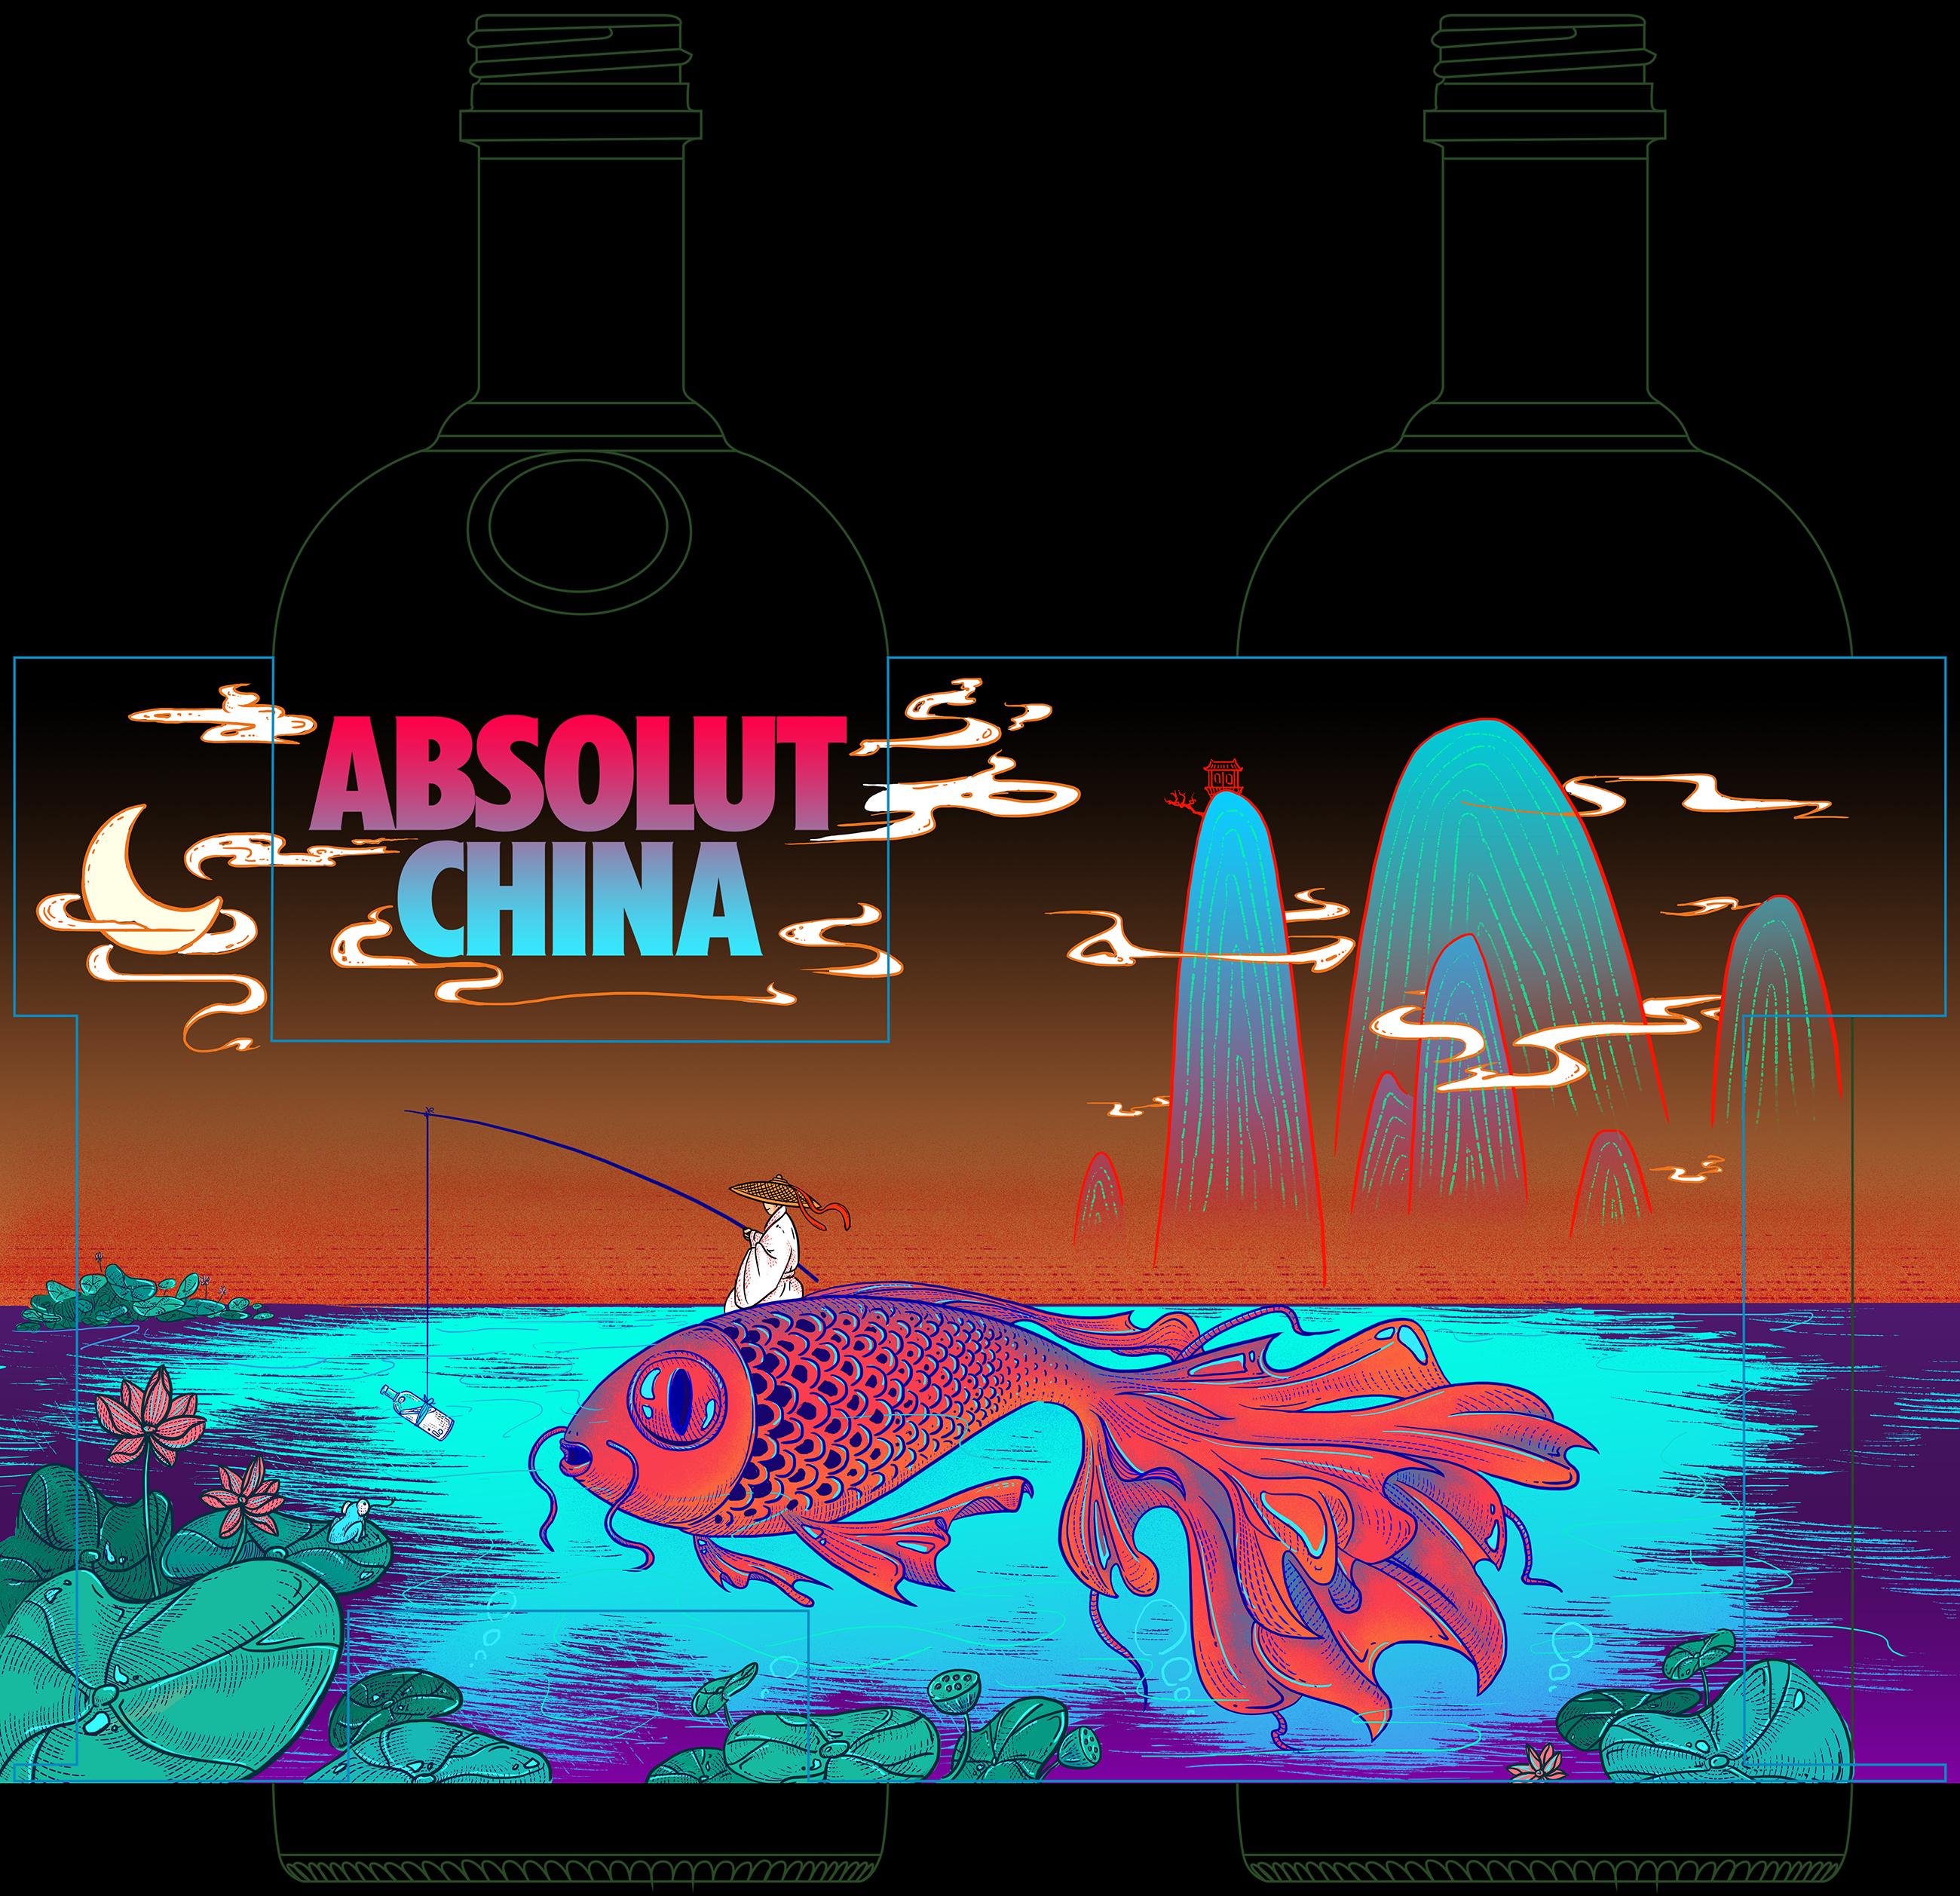 Absolute China